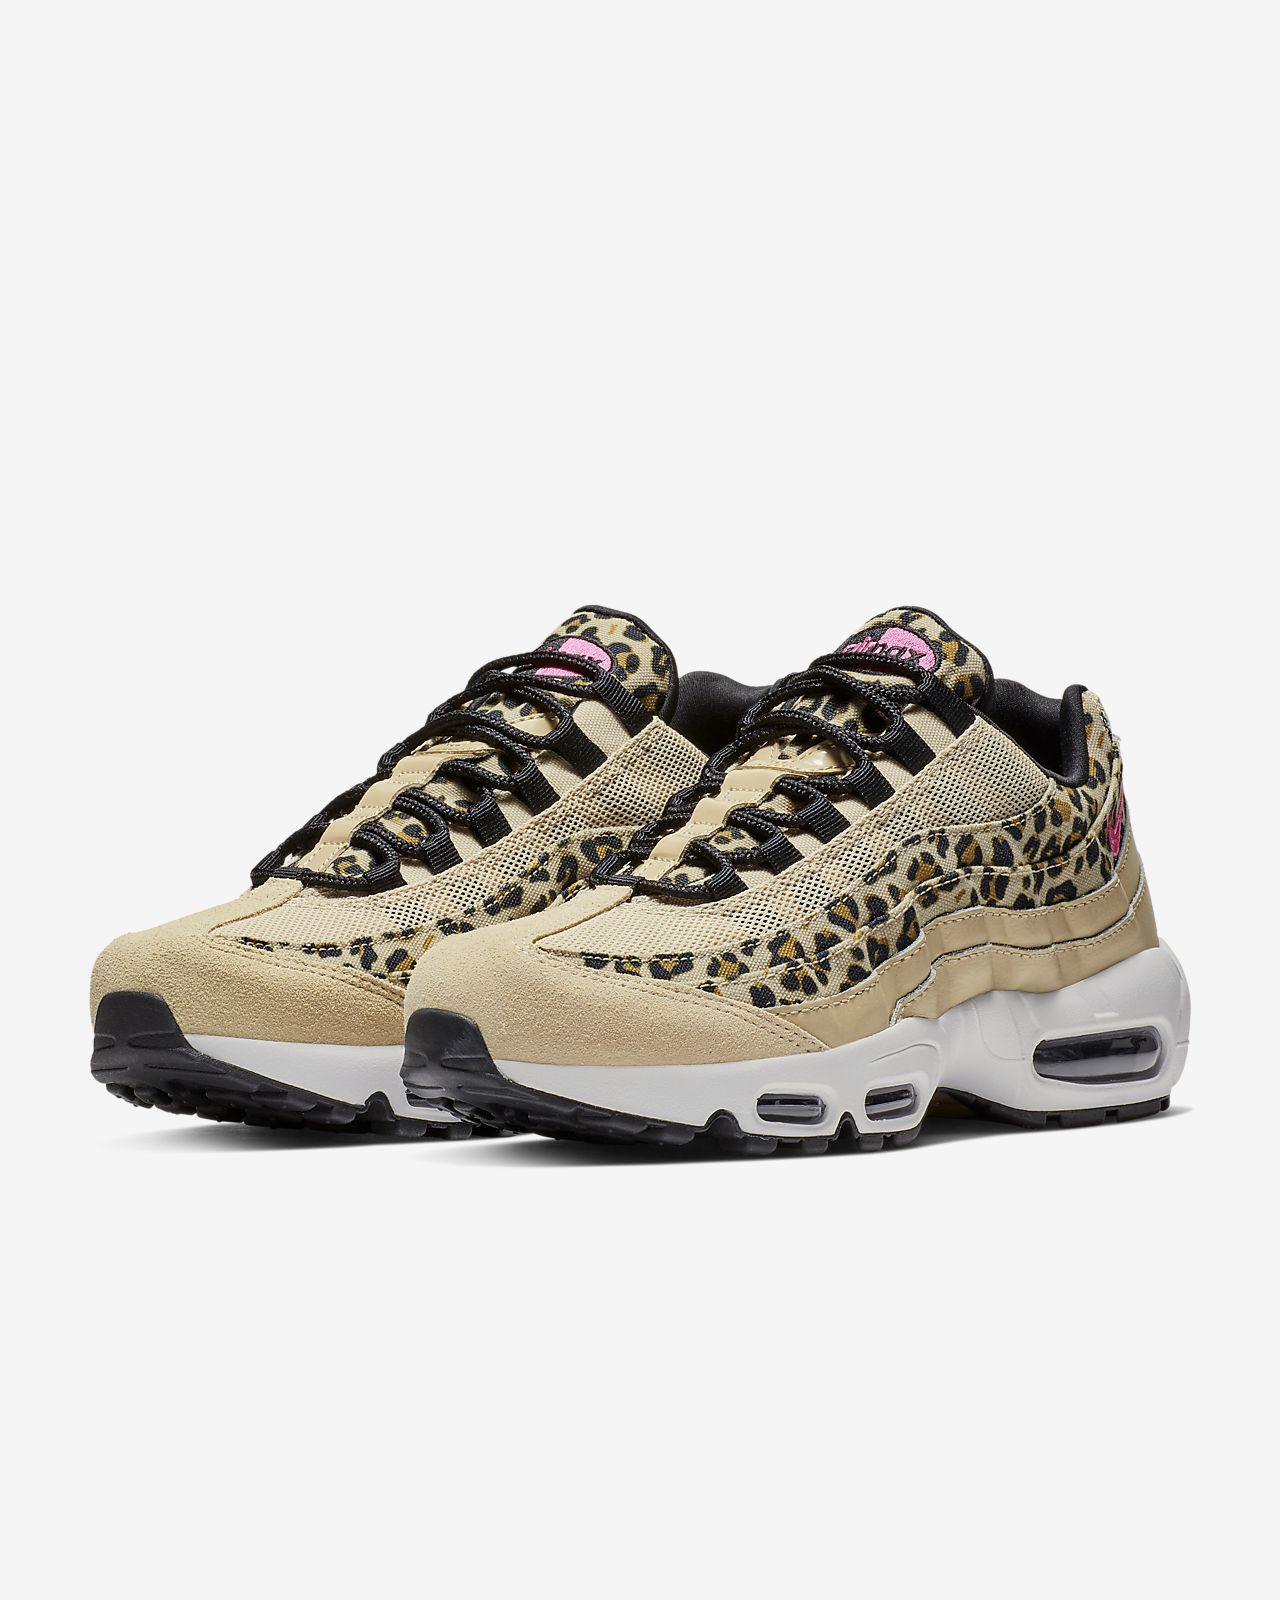 buy popular 5868c 91057 ... Nike Air Max 95 Premium Animal Women s Shoe